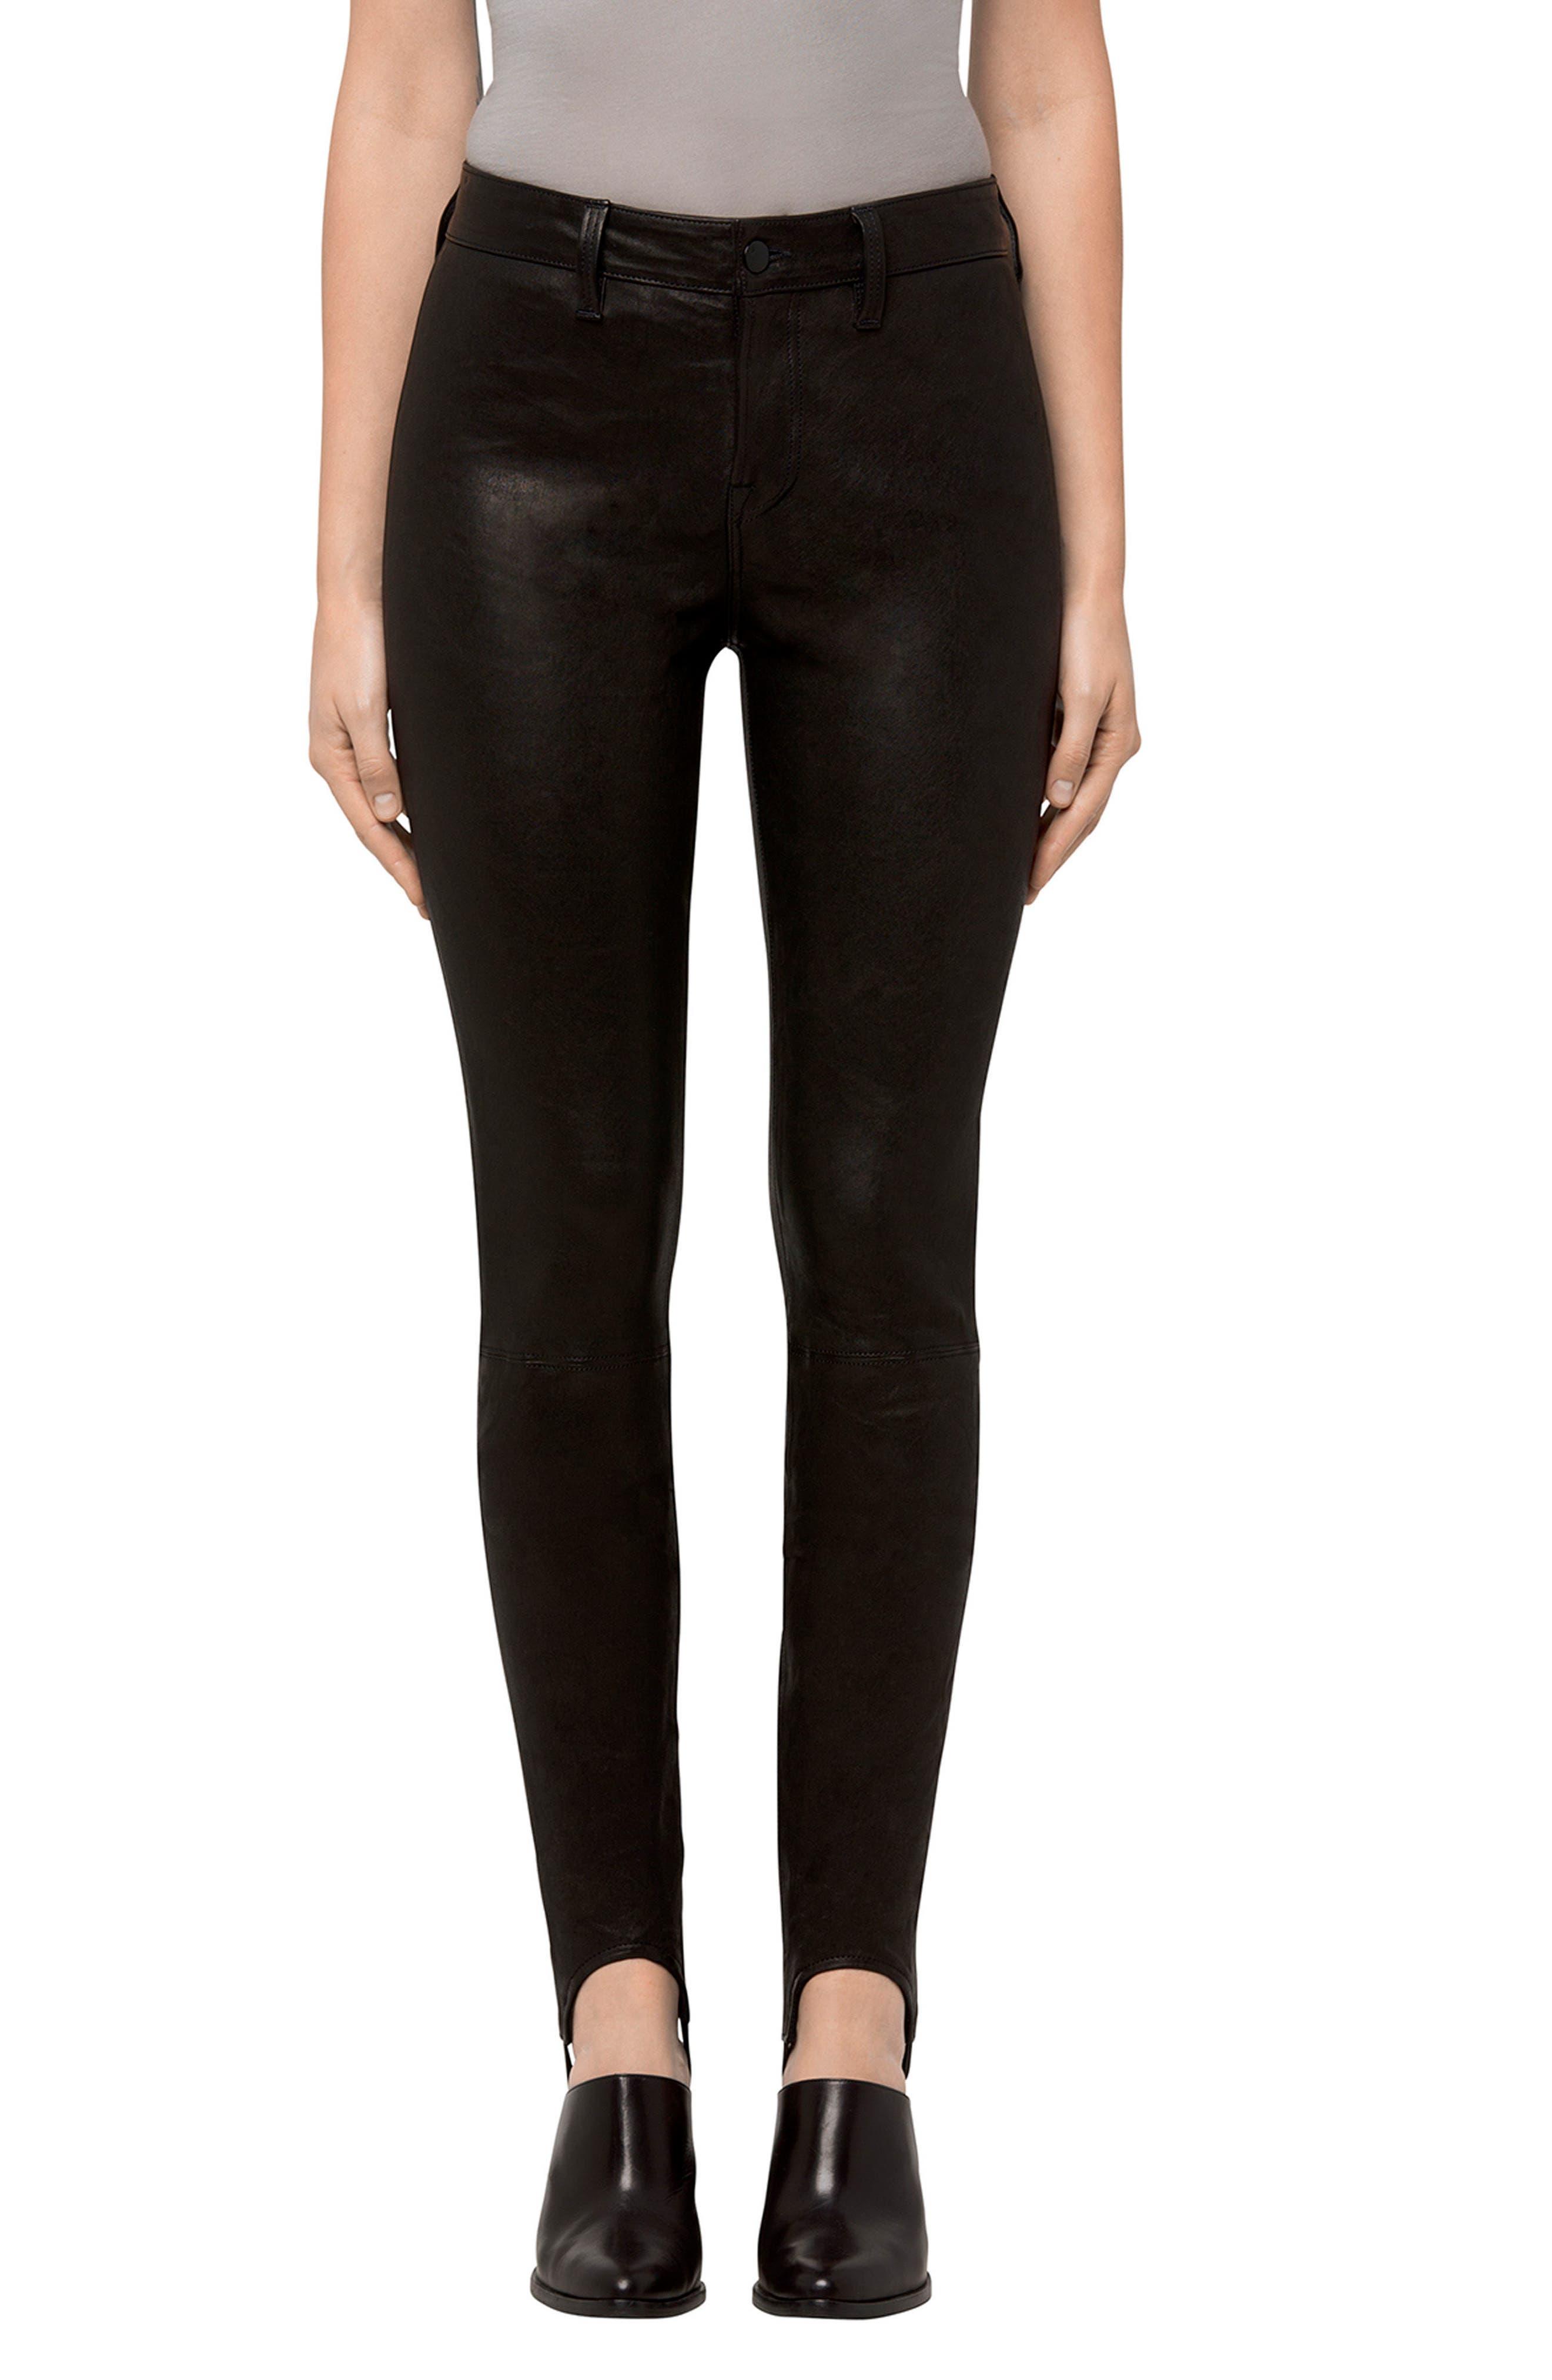 Maria Leather Stirrup Leggings,                         Main,                         color, Black